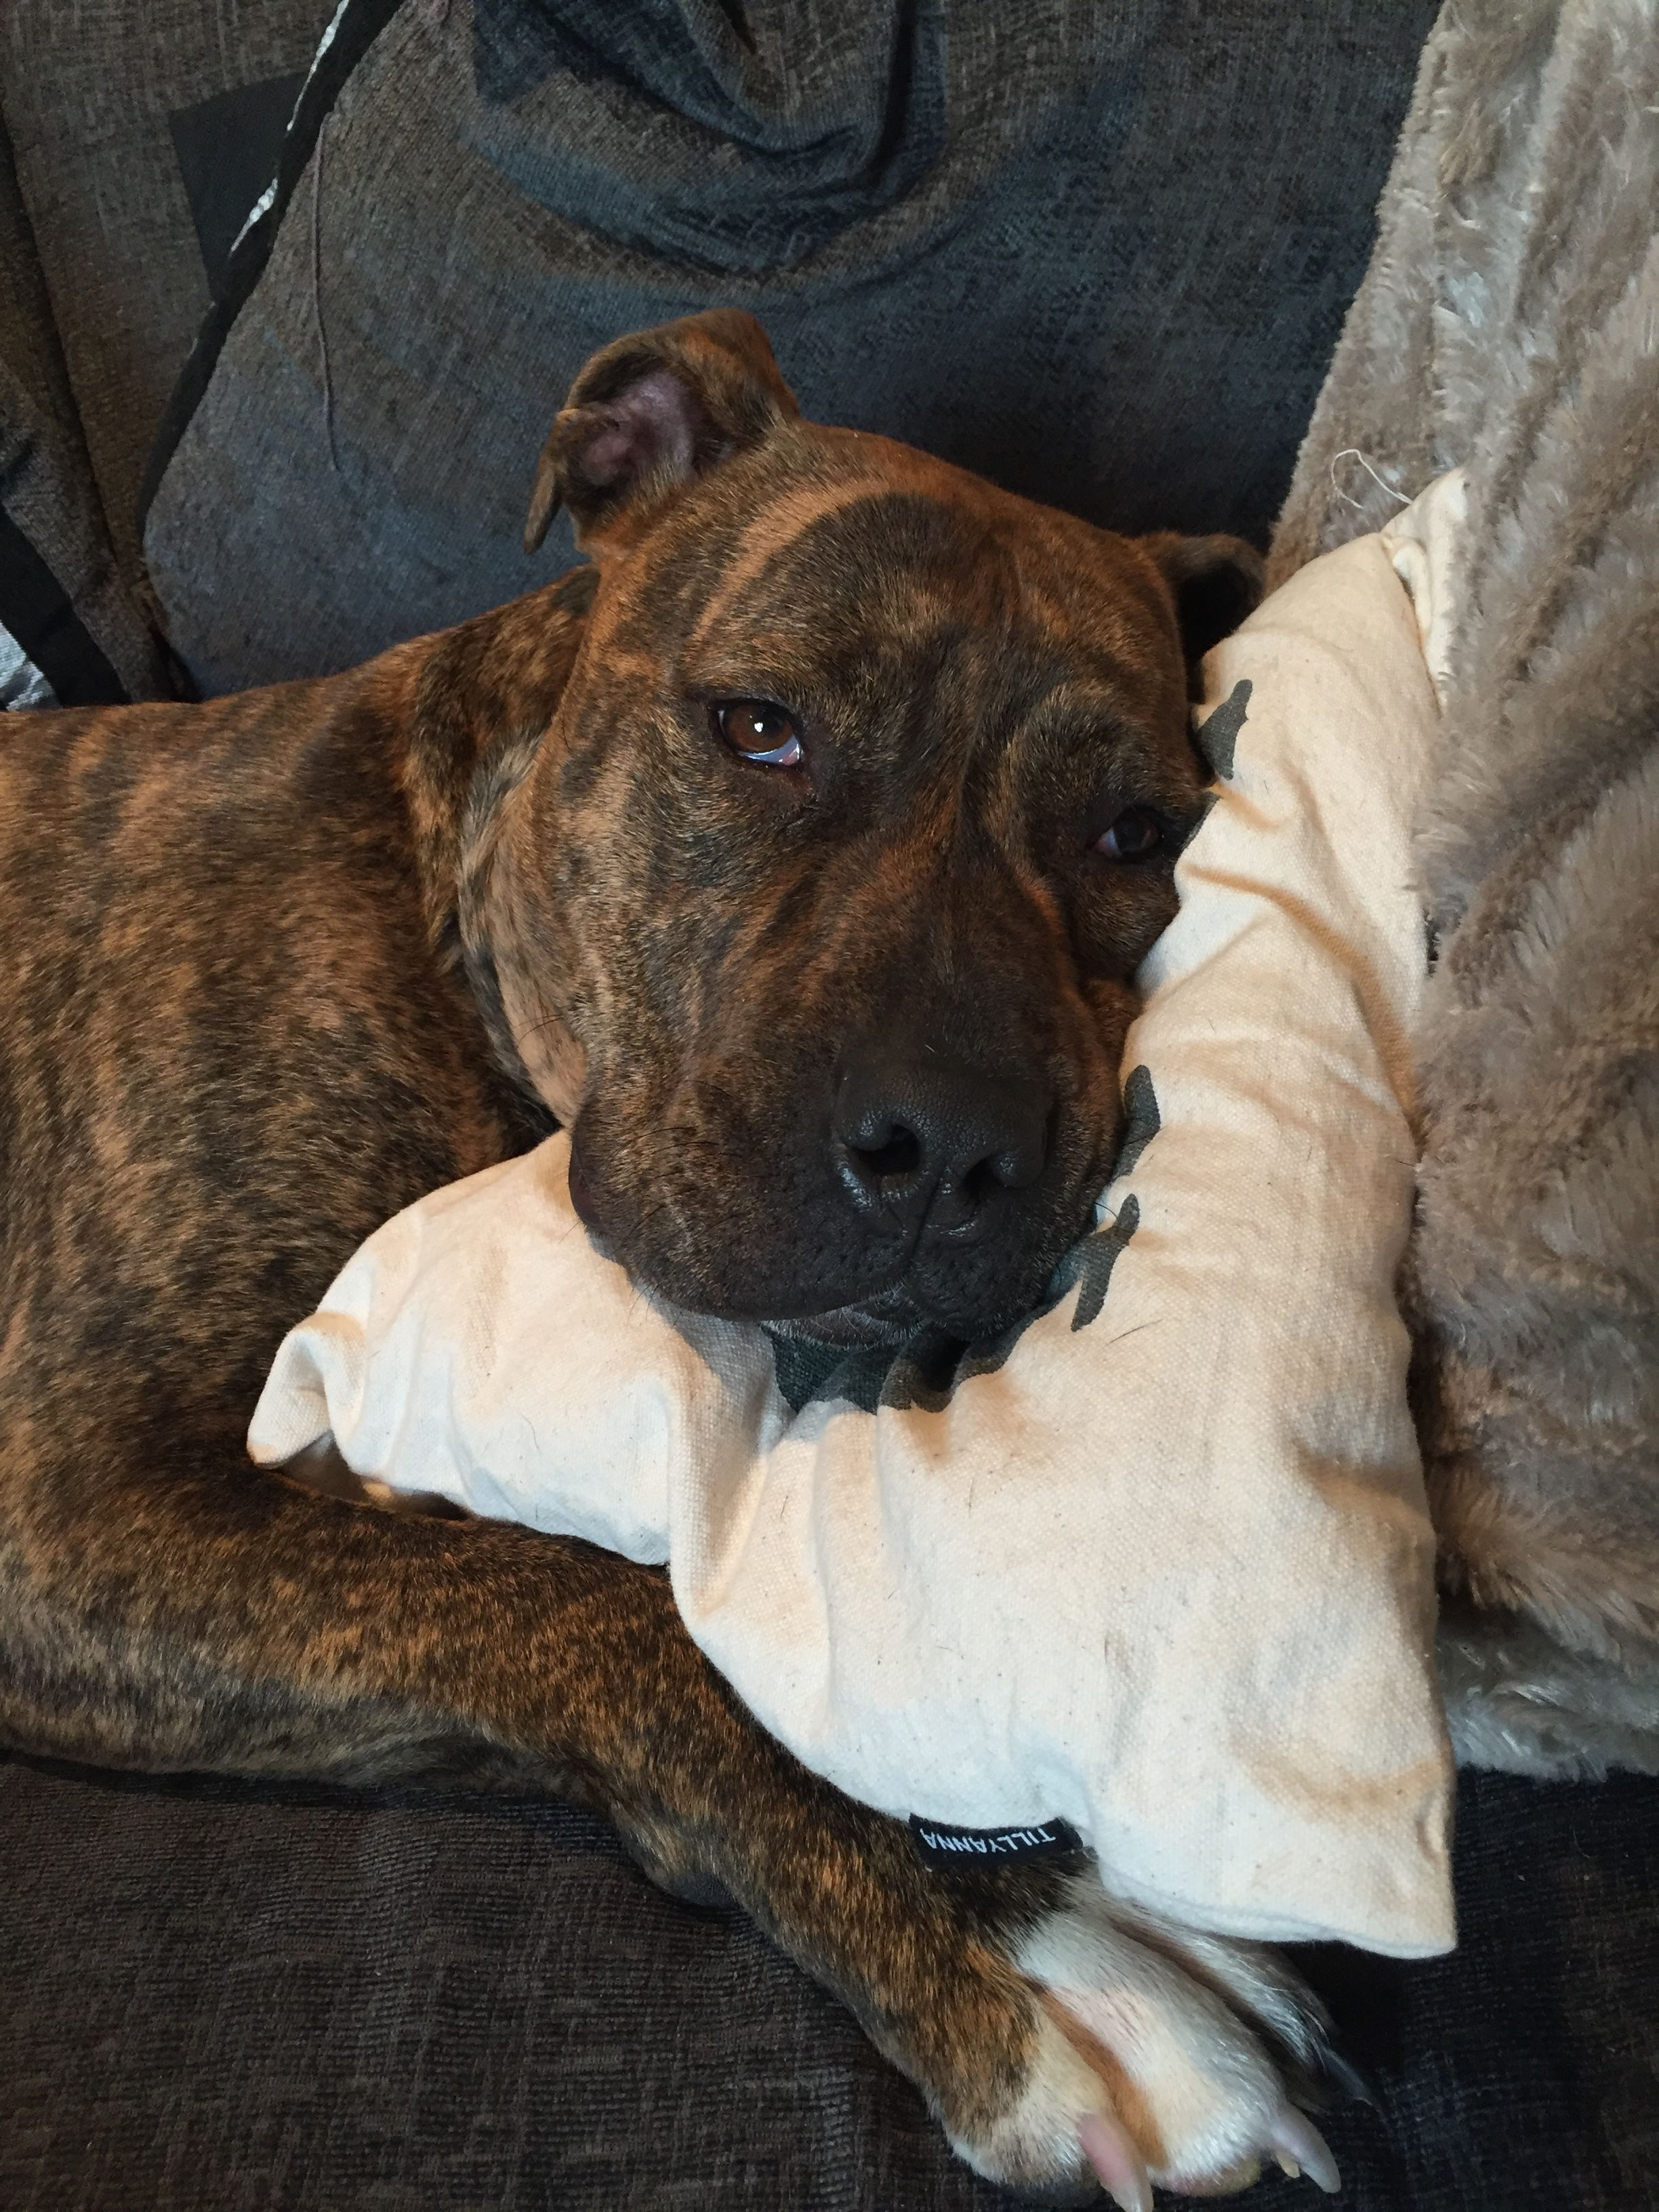 Brindle Staffordshire Bull Terrier Best Dog Breeds Dog Care